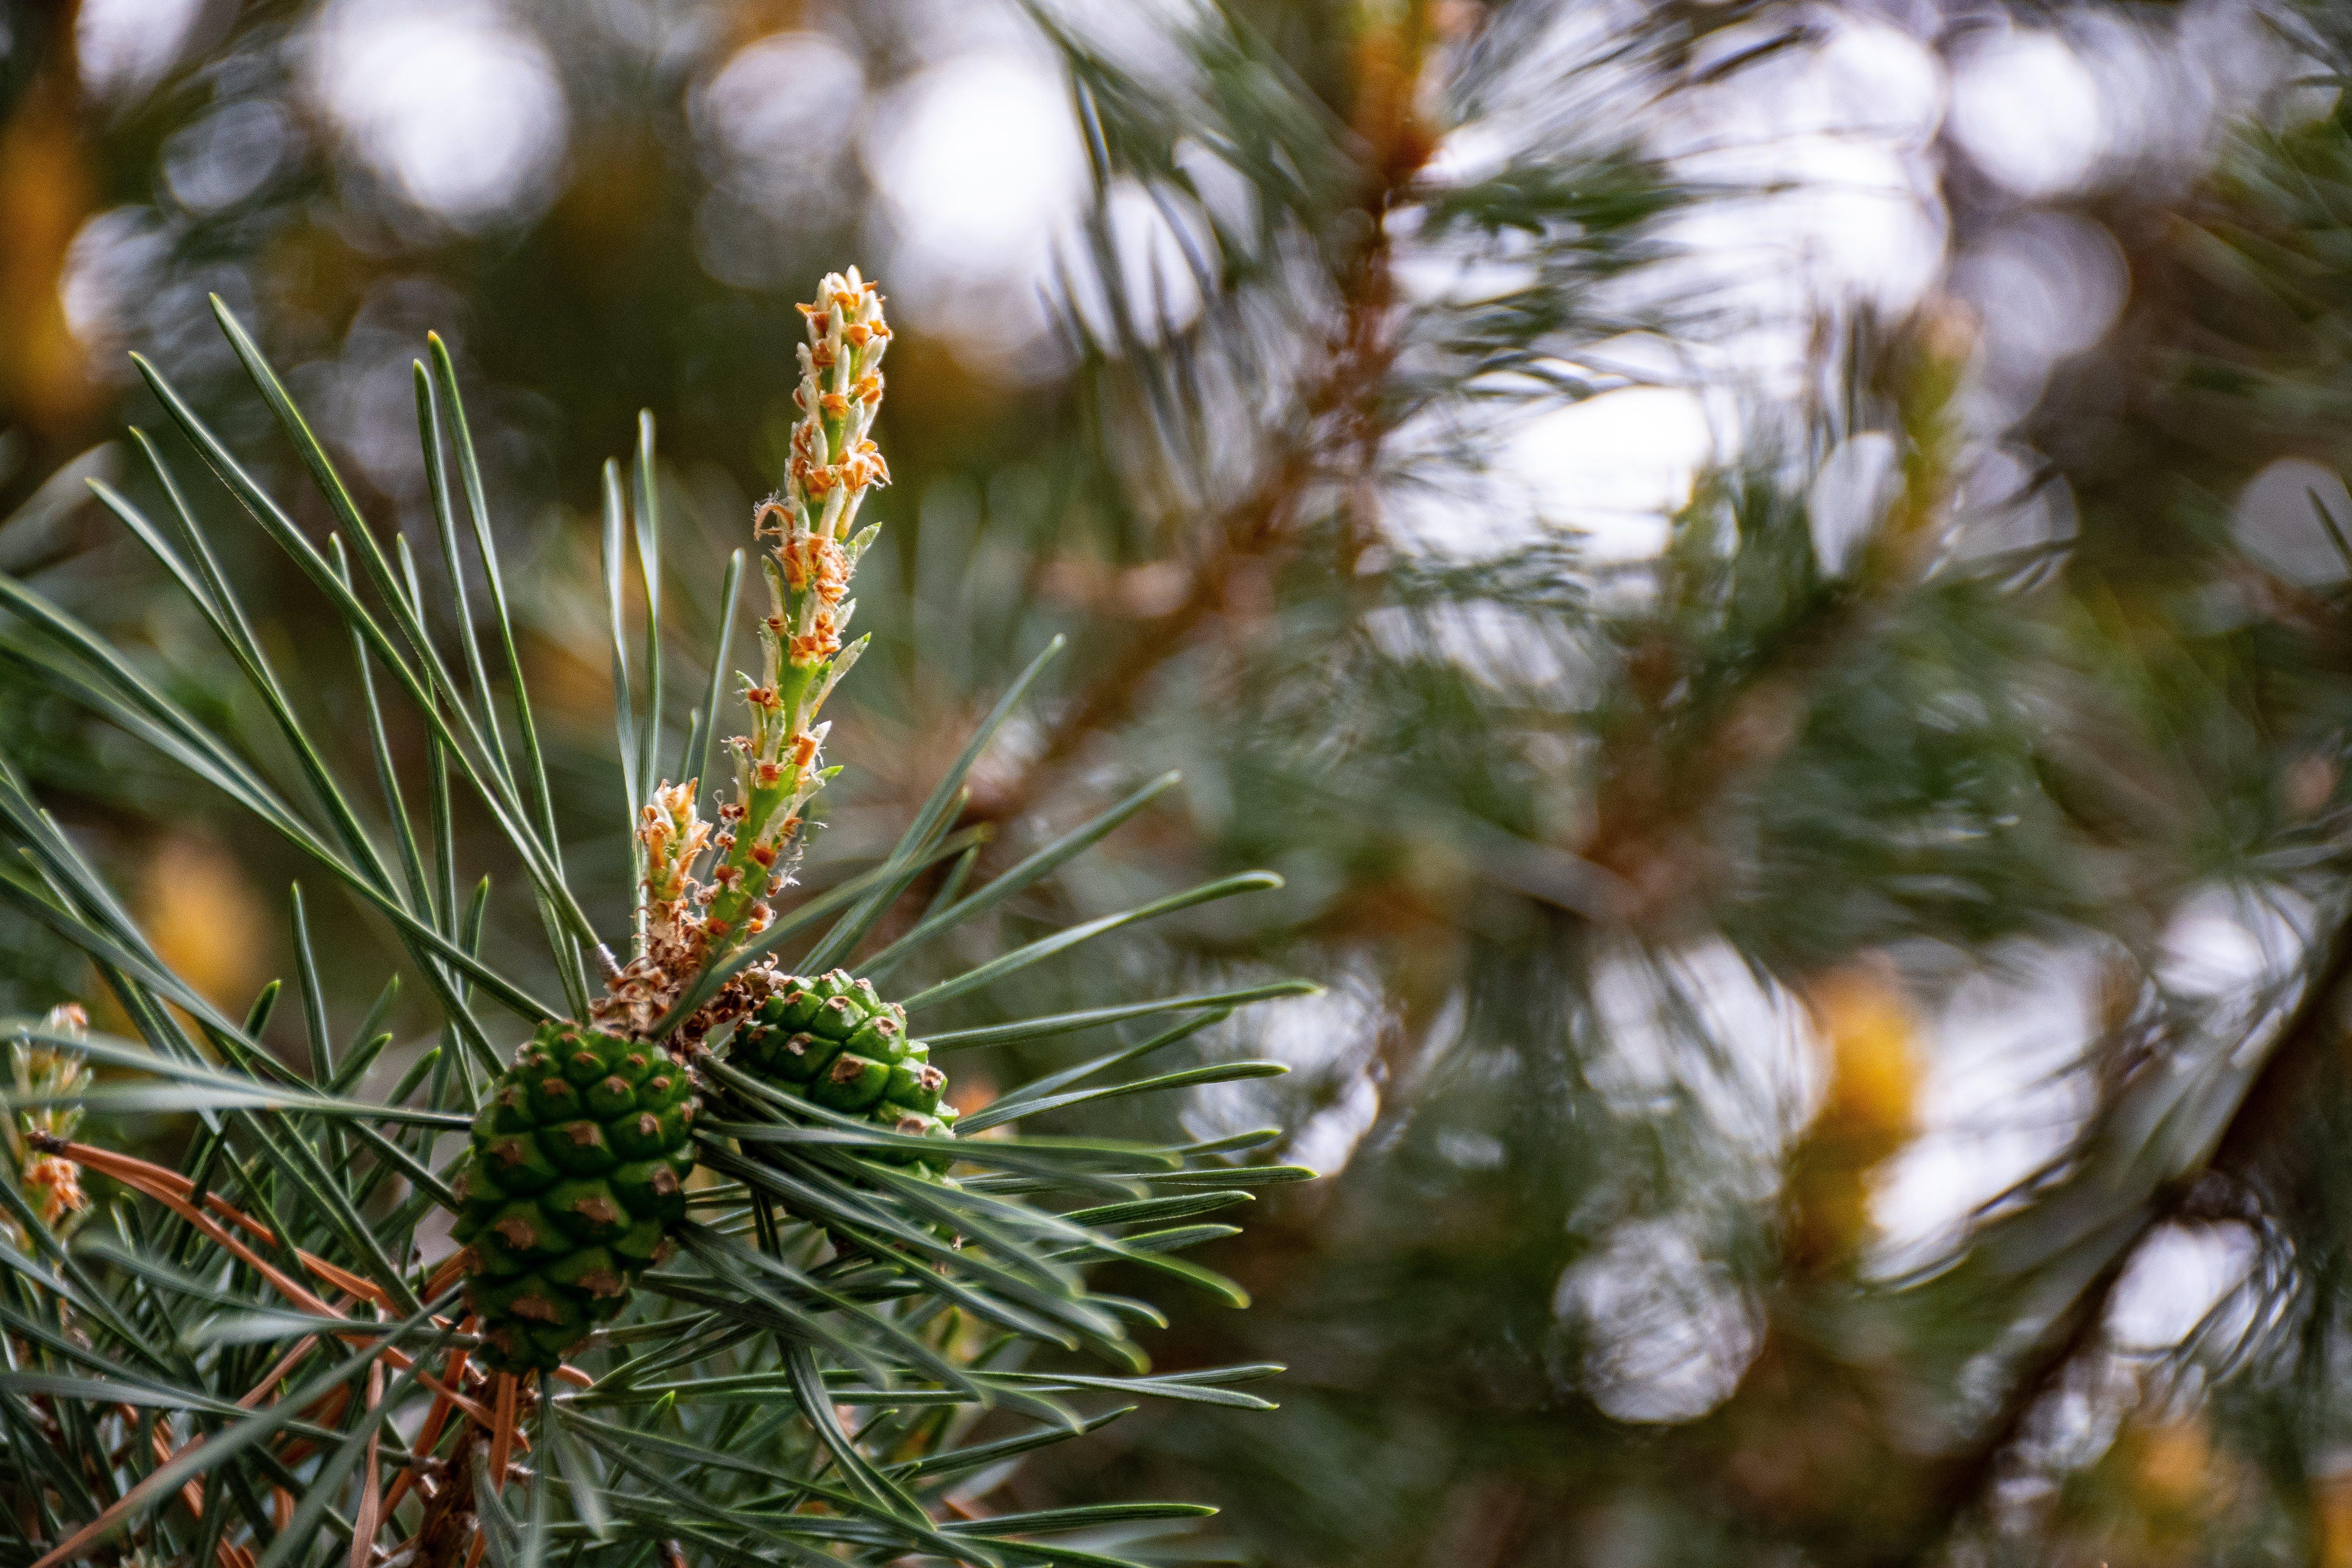 Close Up Photo of Pine Tree